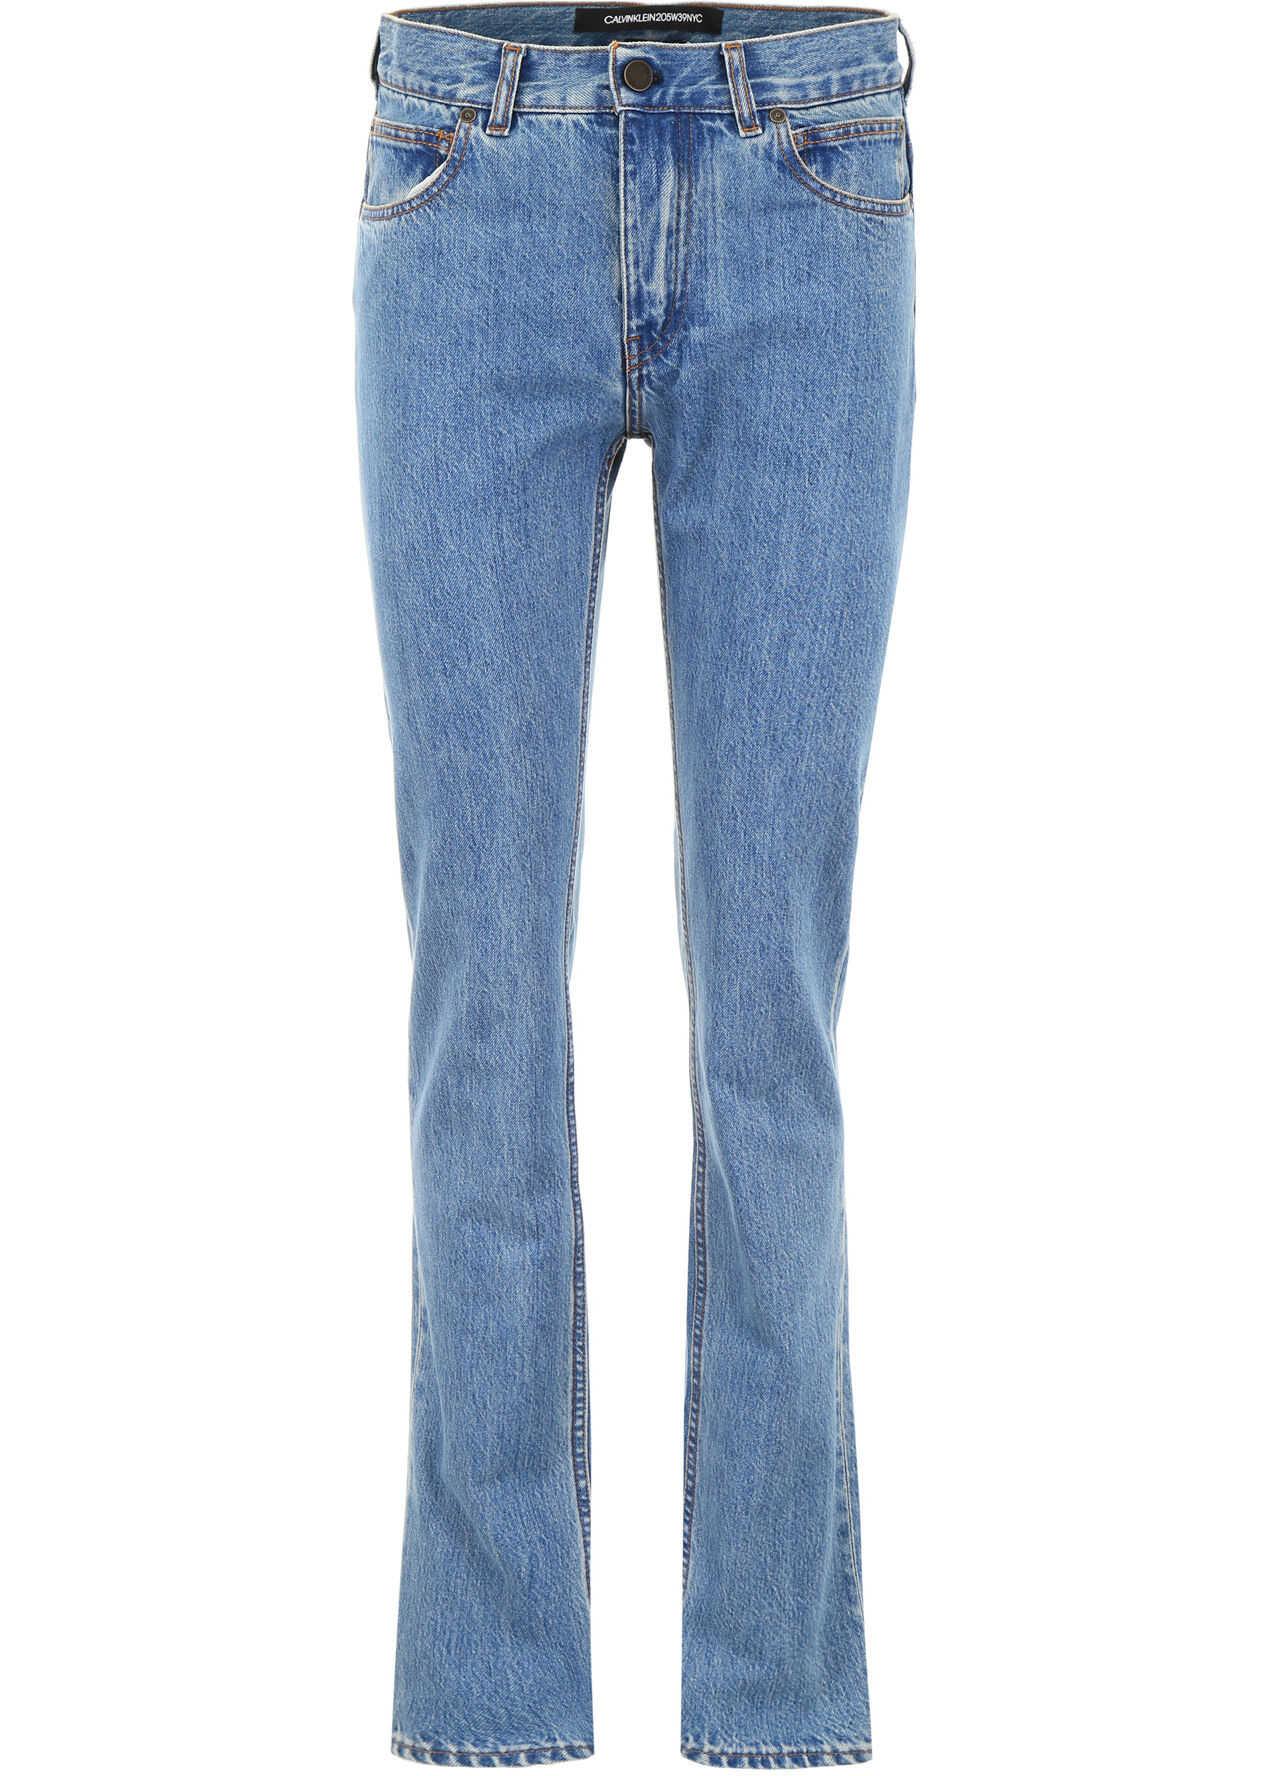 Calvin Klein 205W39NYC Jeans Five Pockets BLUE